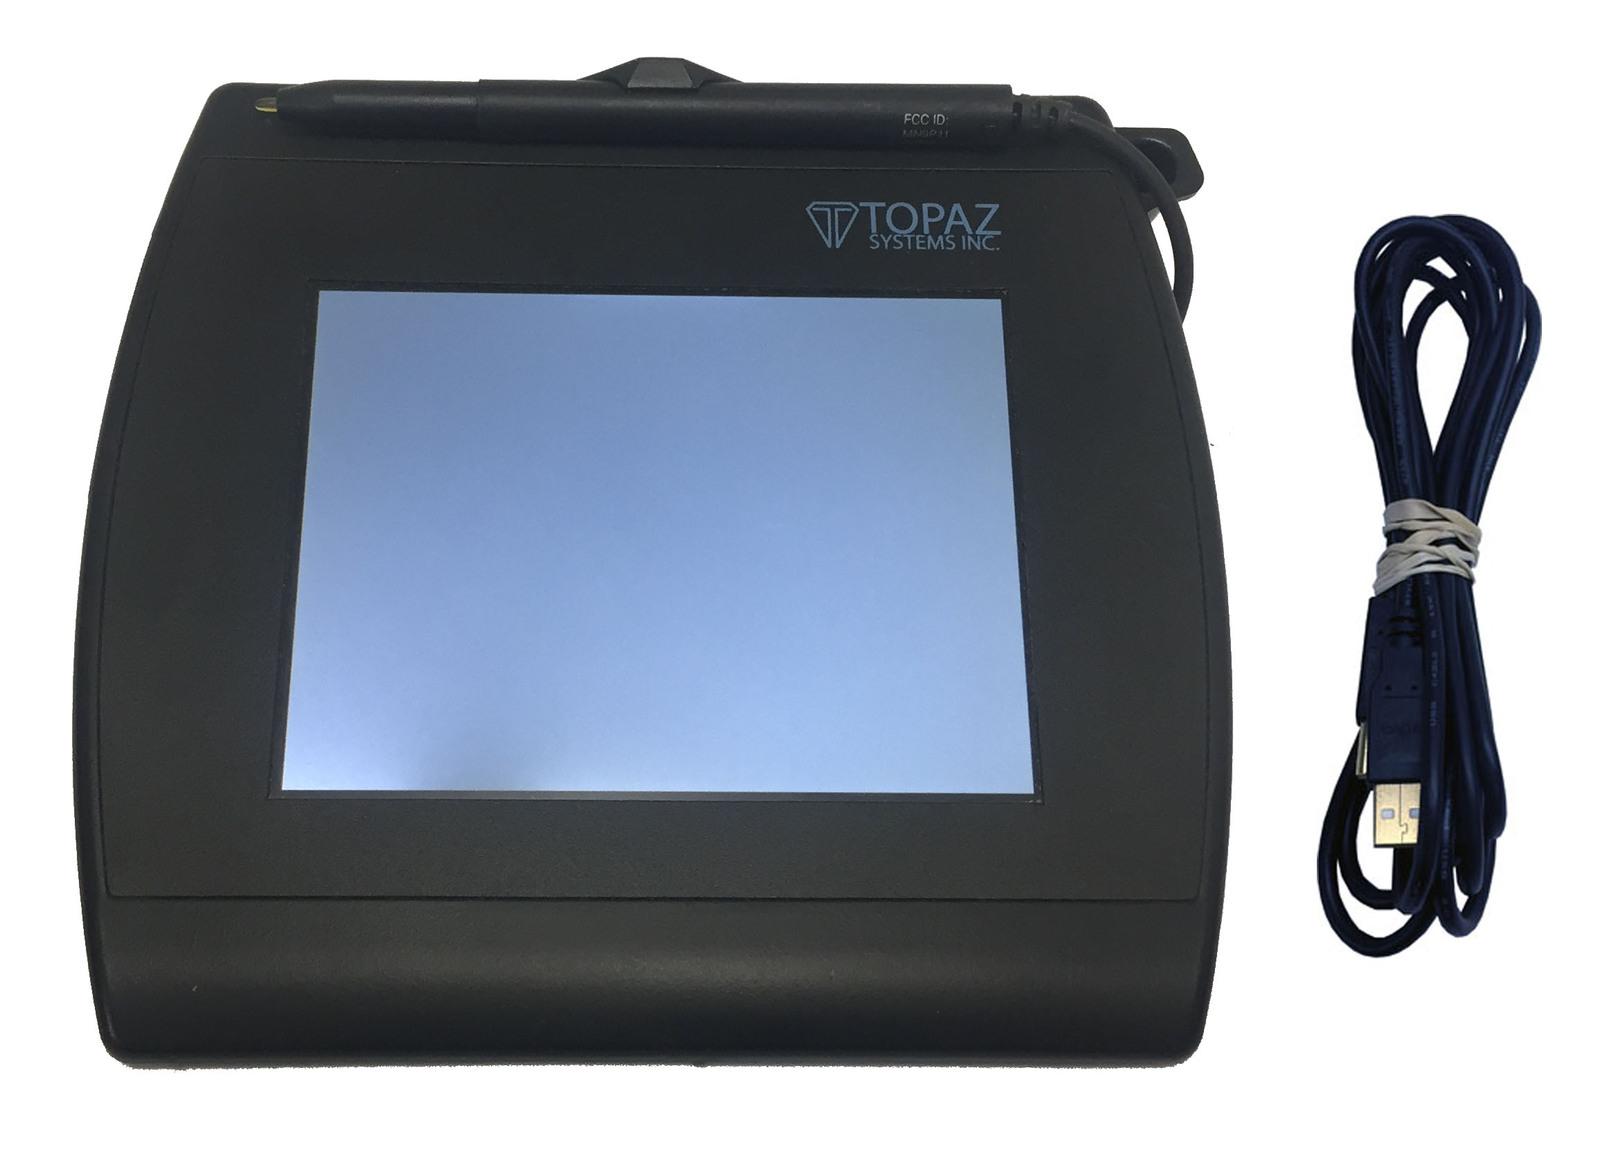 Topaz systems signature pad 1